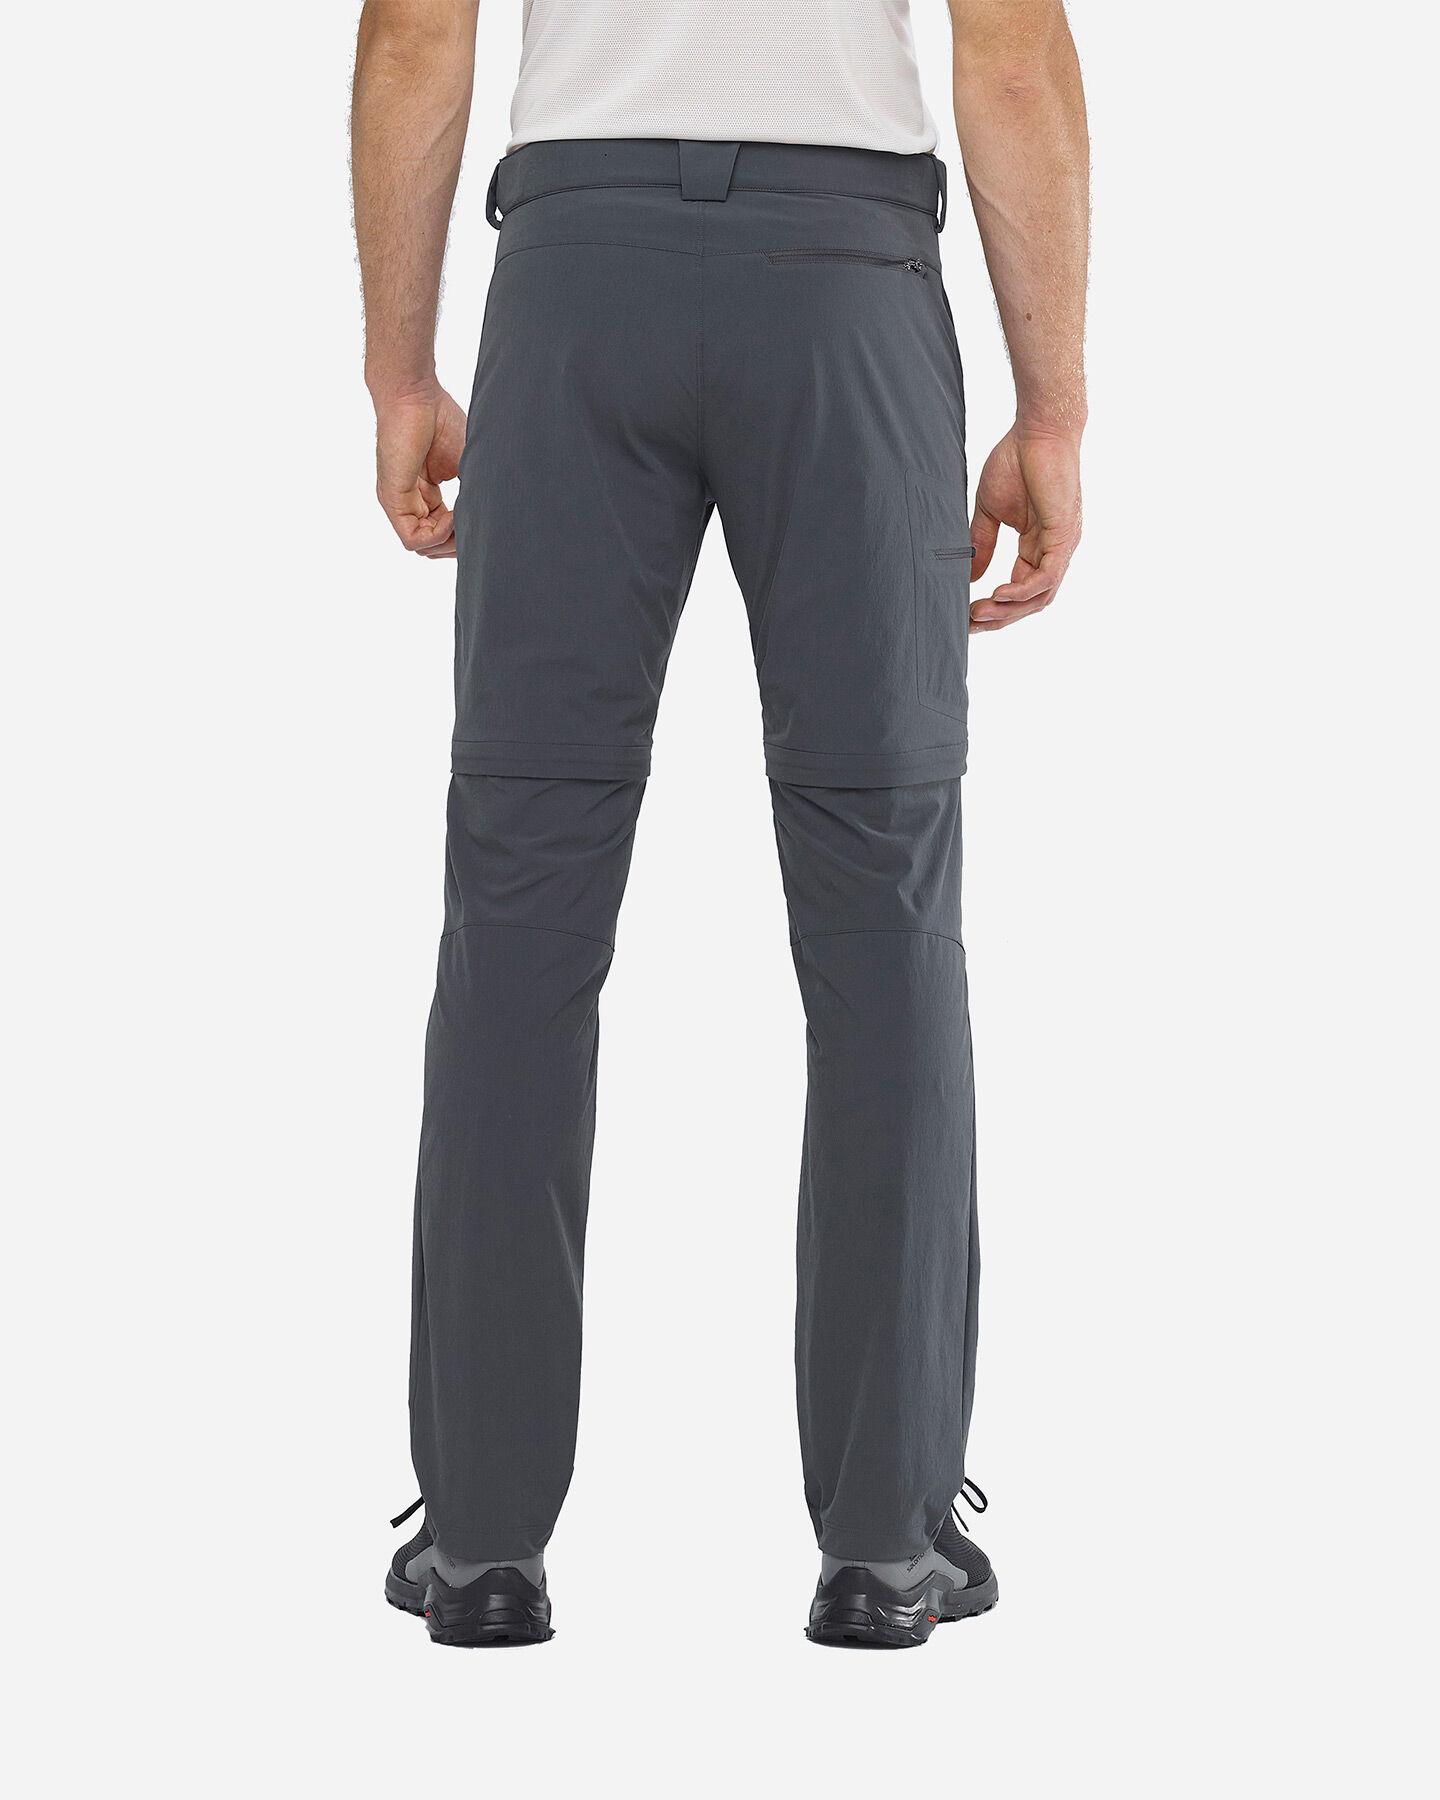 Pantalone outdoor SALOMON WAYFARER ZIP M S5173951 scatto 4